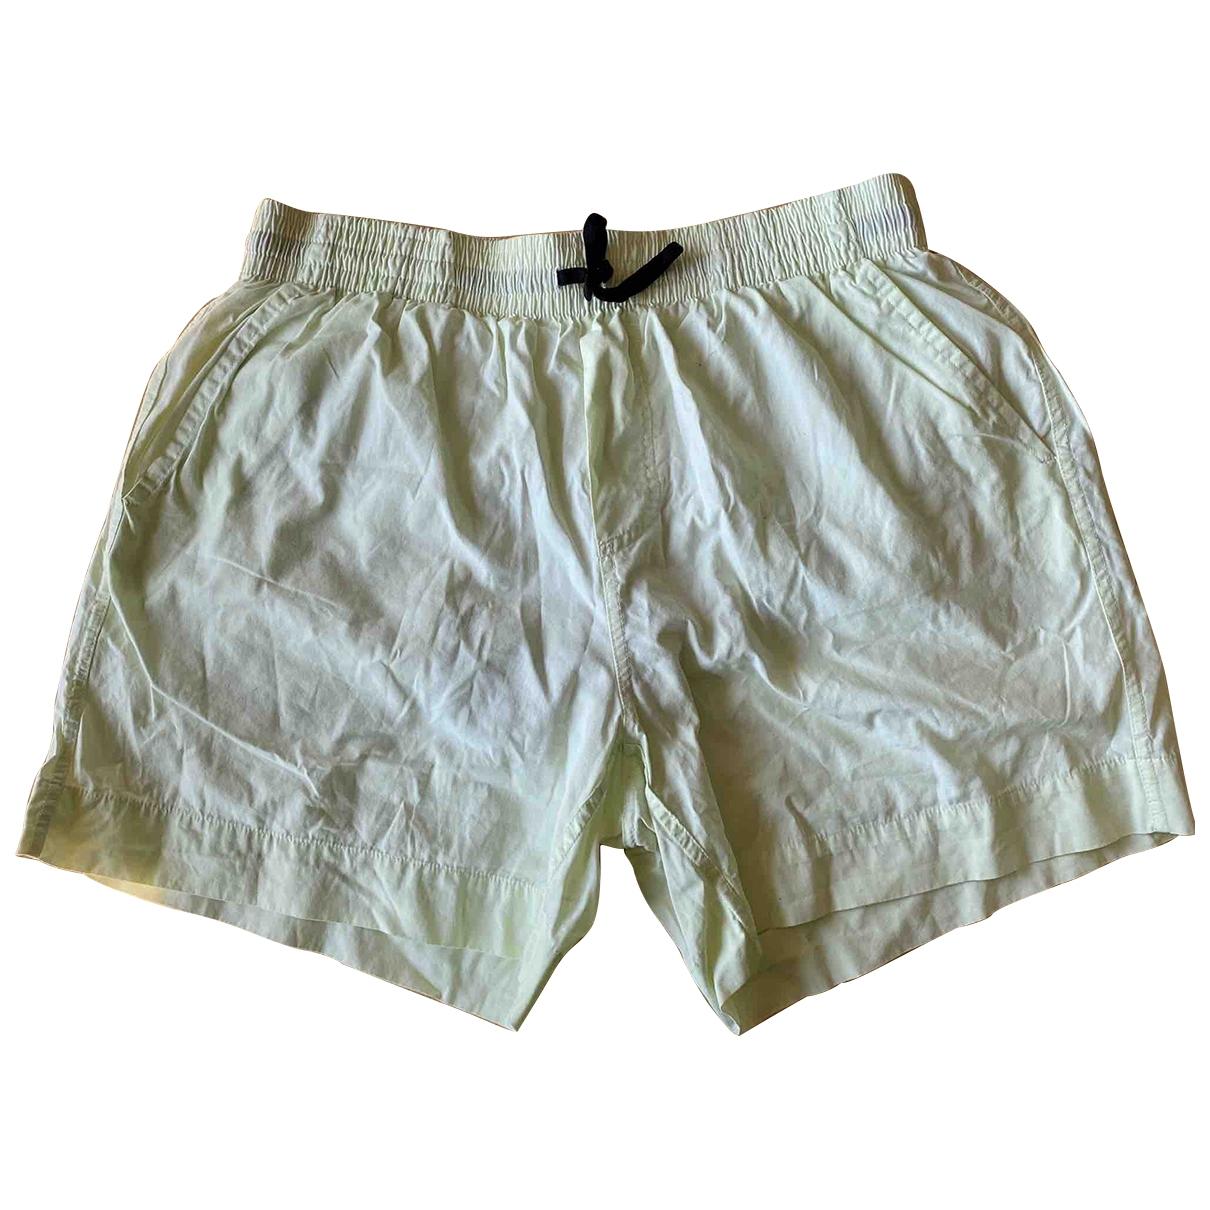 Balmain \N Green Cotton - elasthane Swimwear for Men M International